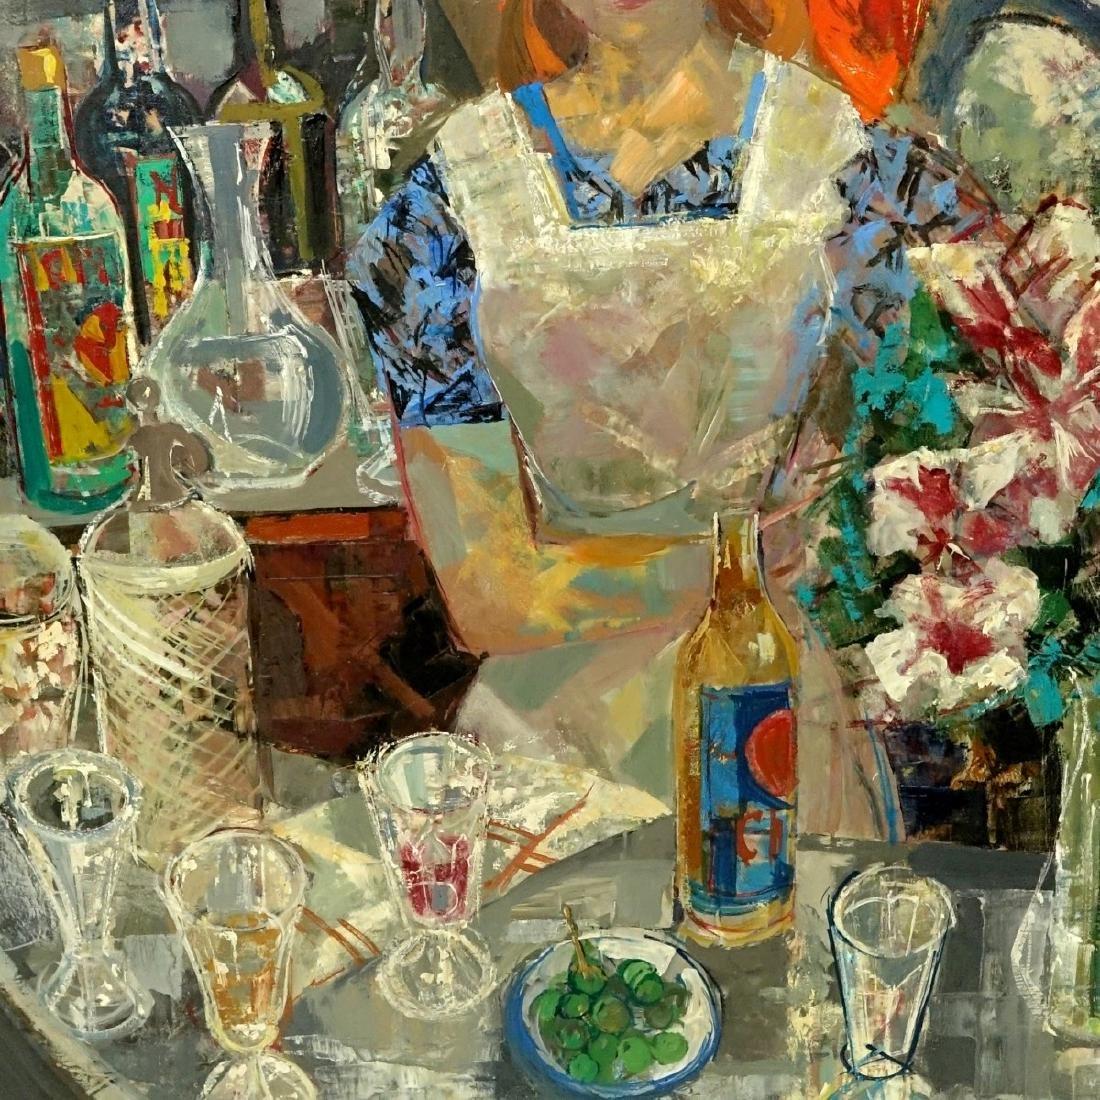 Emilio Grau-Sala, Spanish  (1911 - 1975) Oil - 2